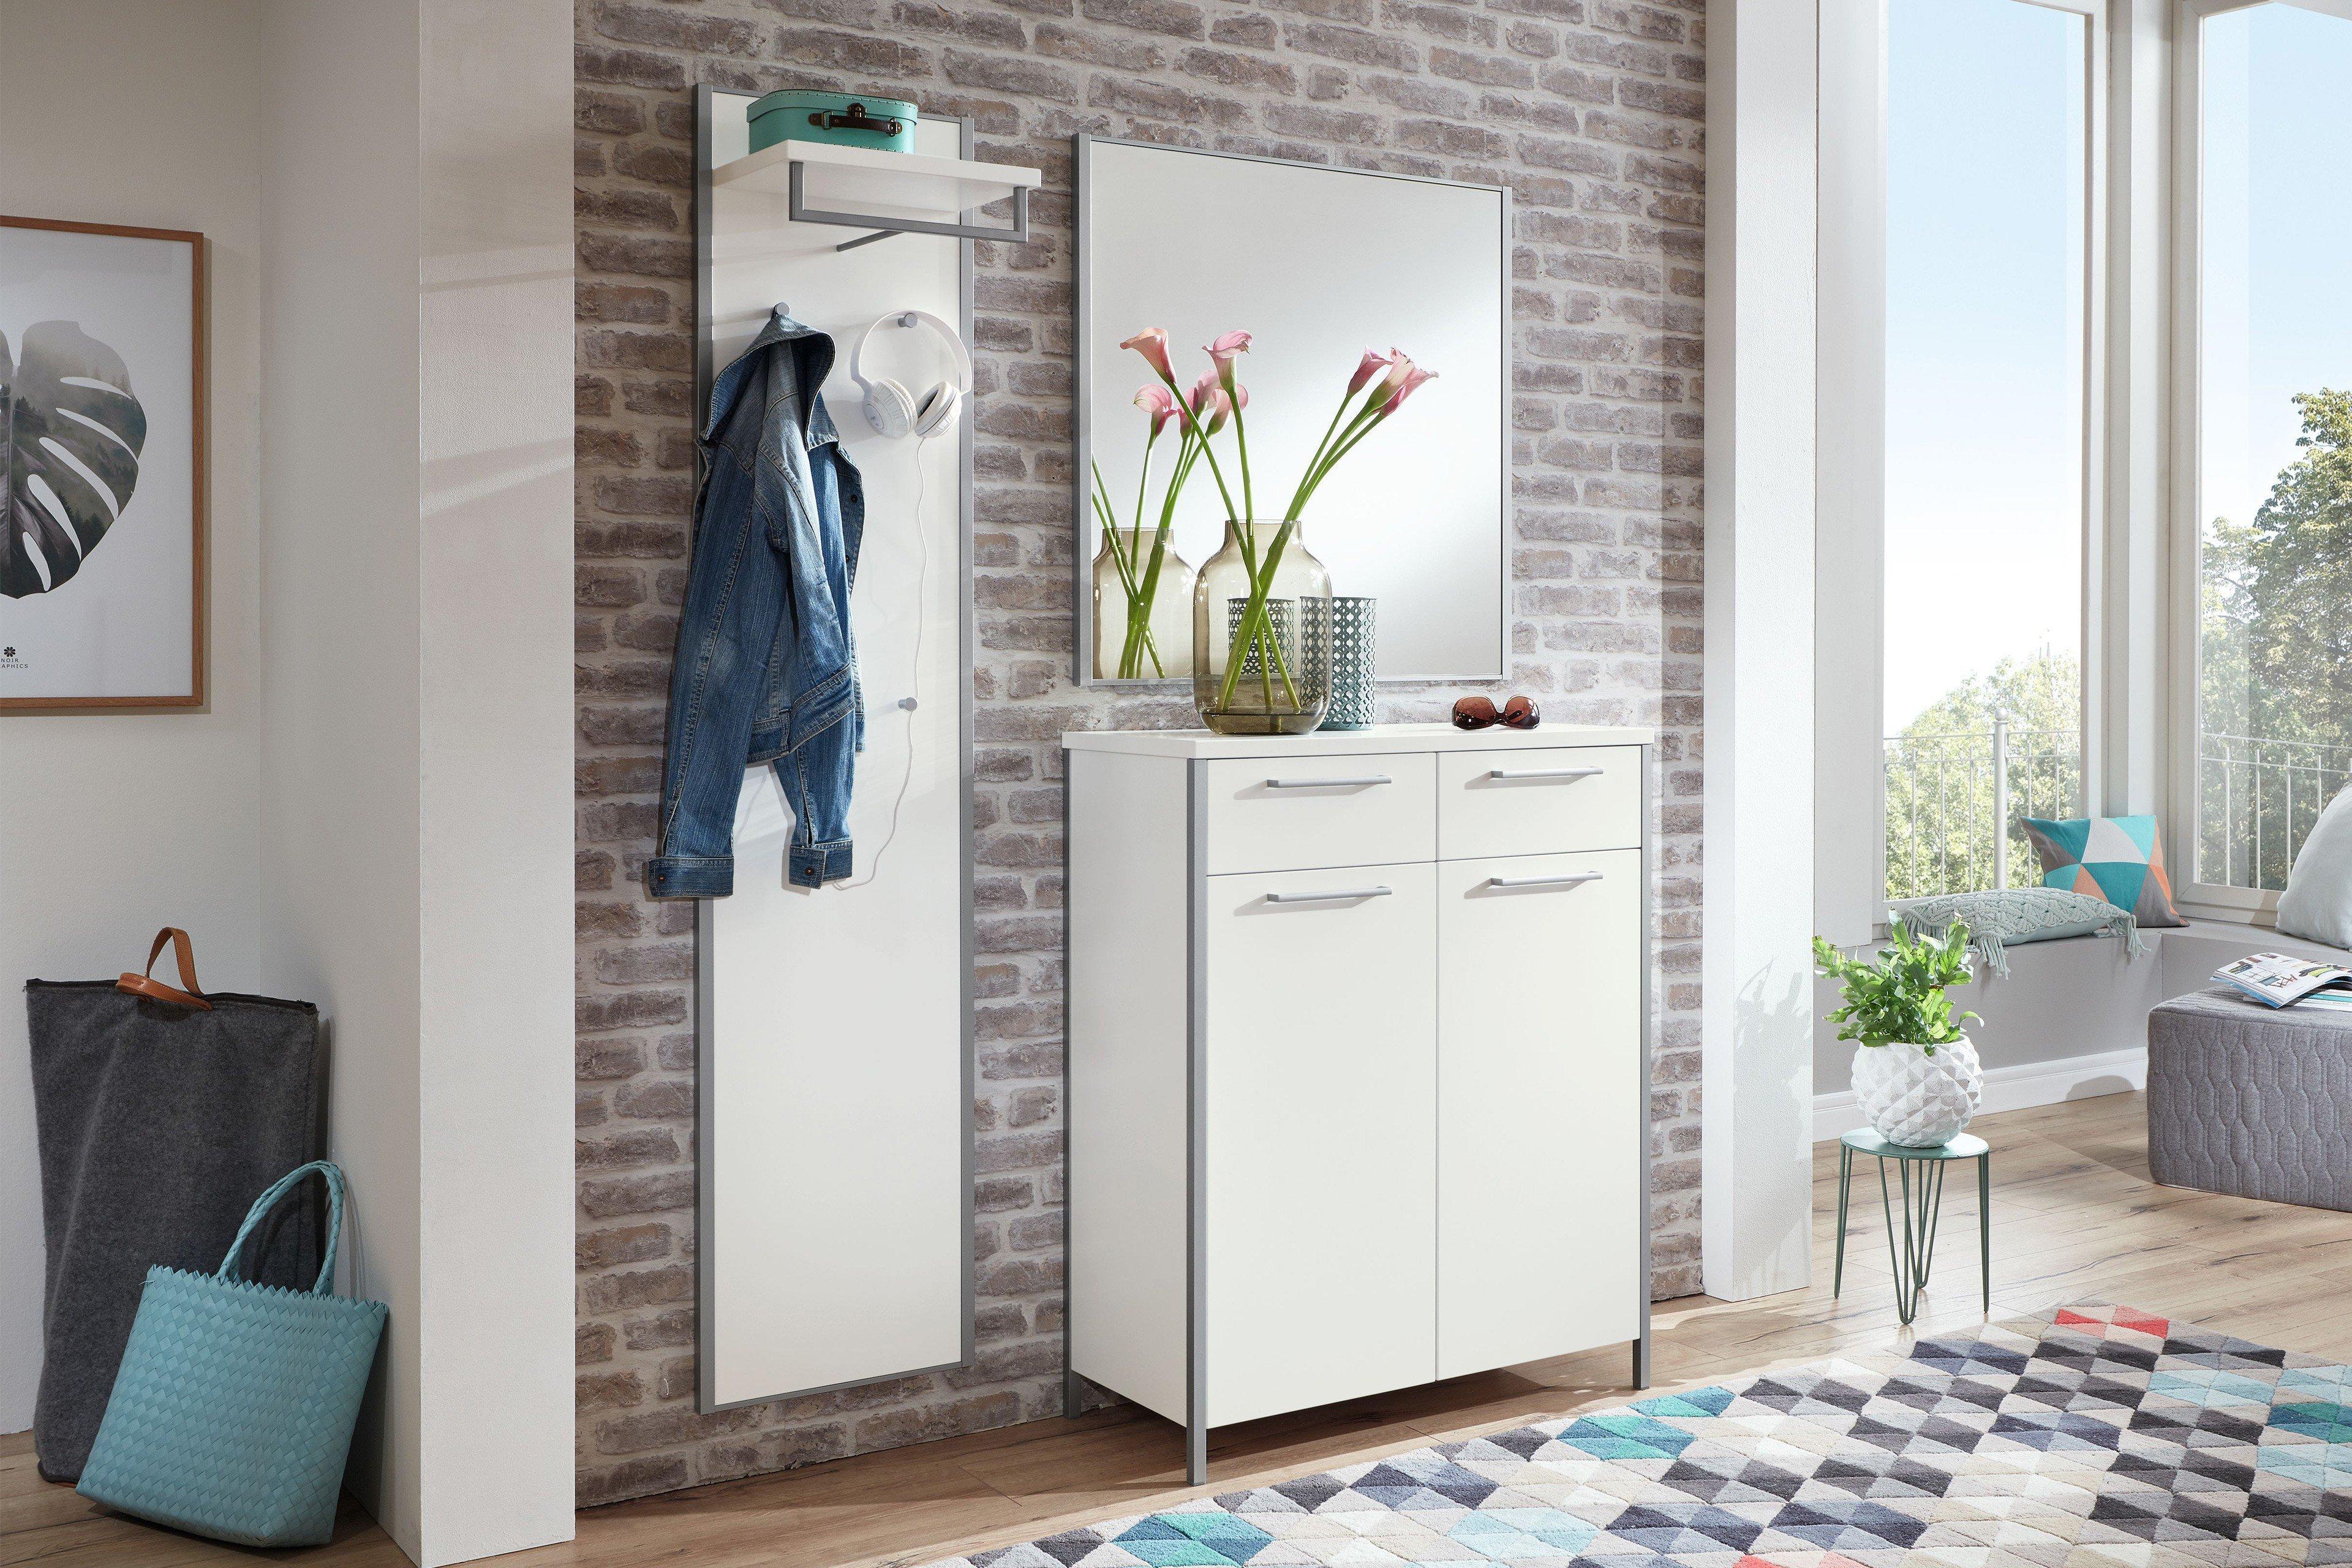 voss garderobe limana lack wei mit kommode spiegel. Black Bedroom Furniture Sets. Home Design Ideas